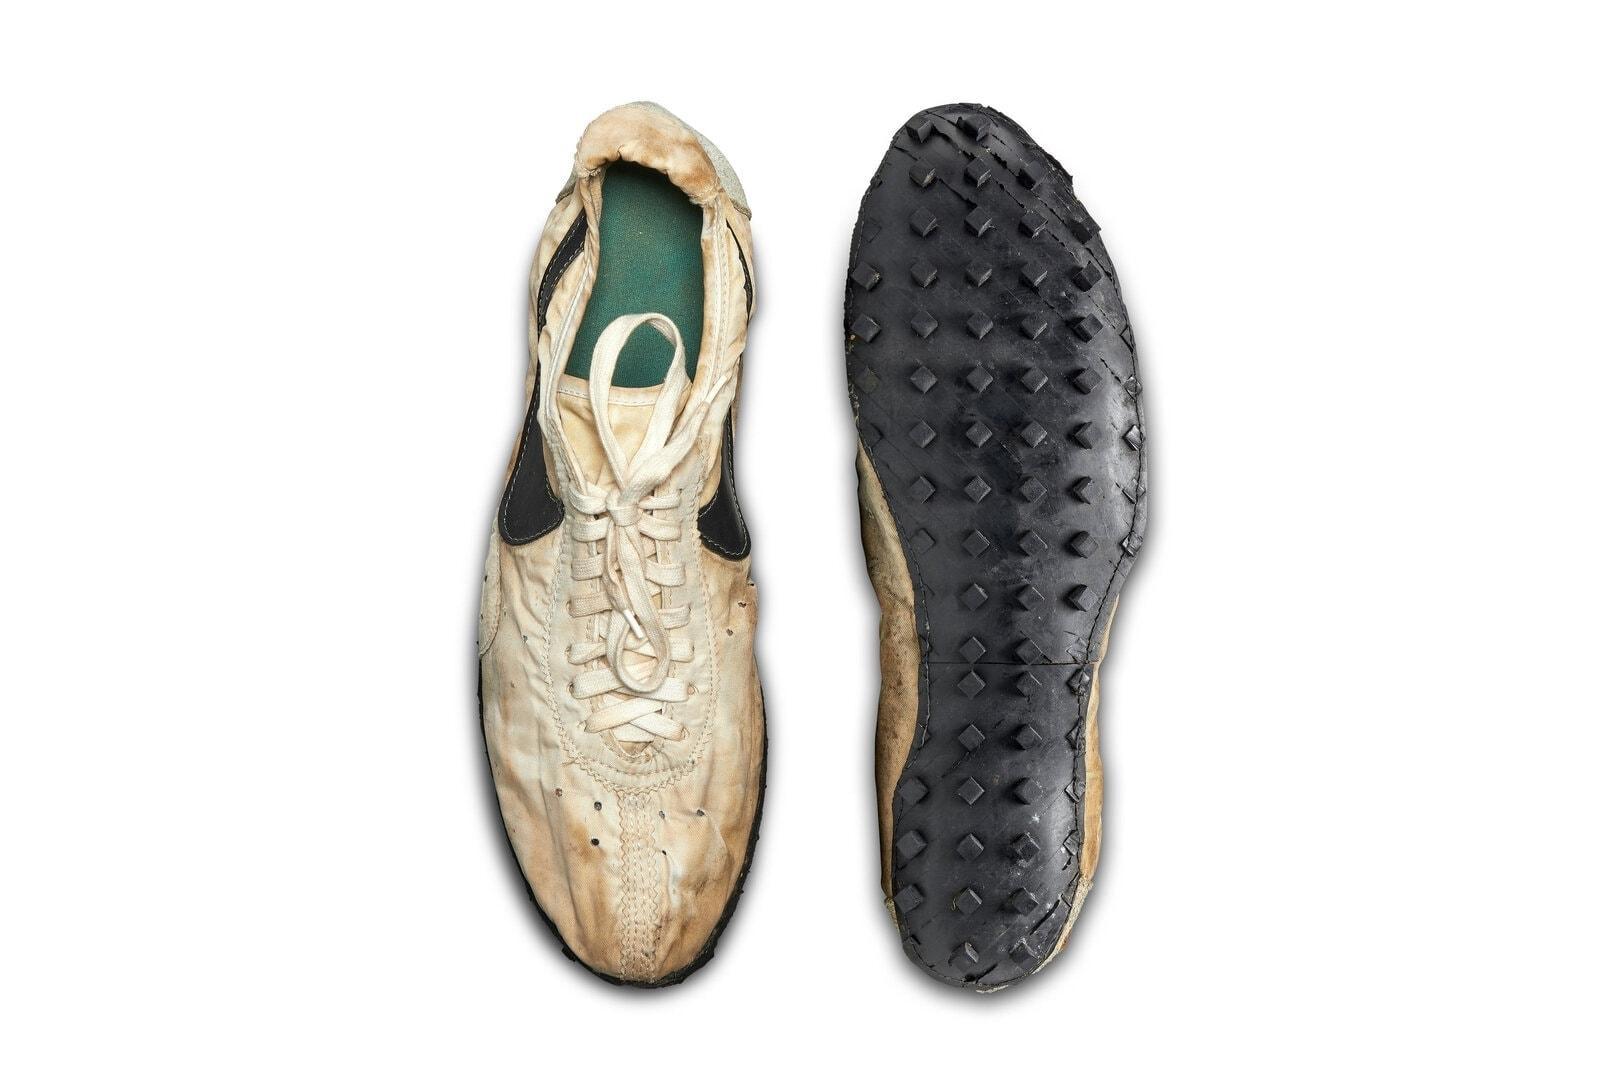 Nike Moon Shoe Auktion